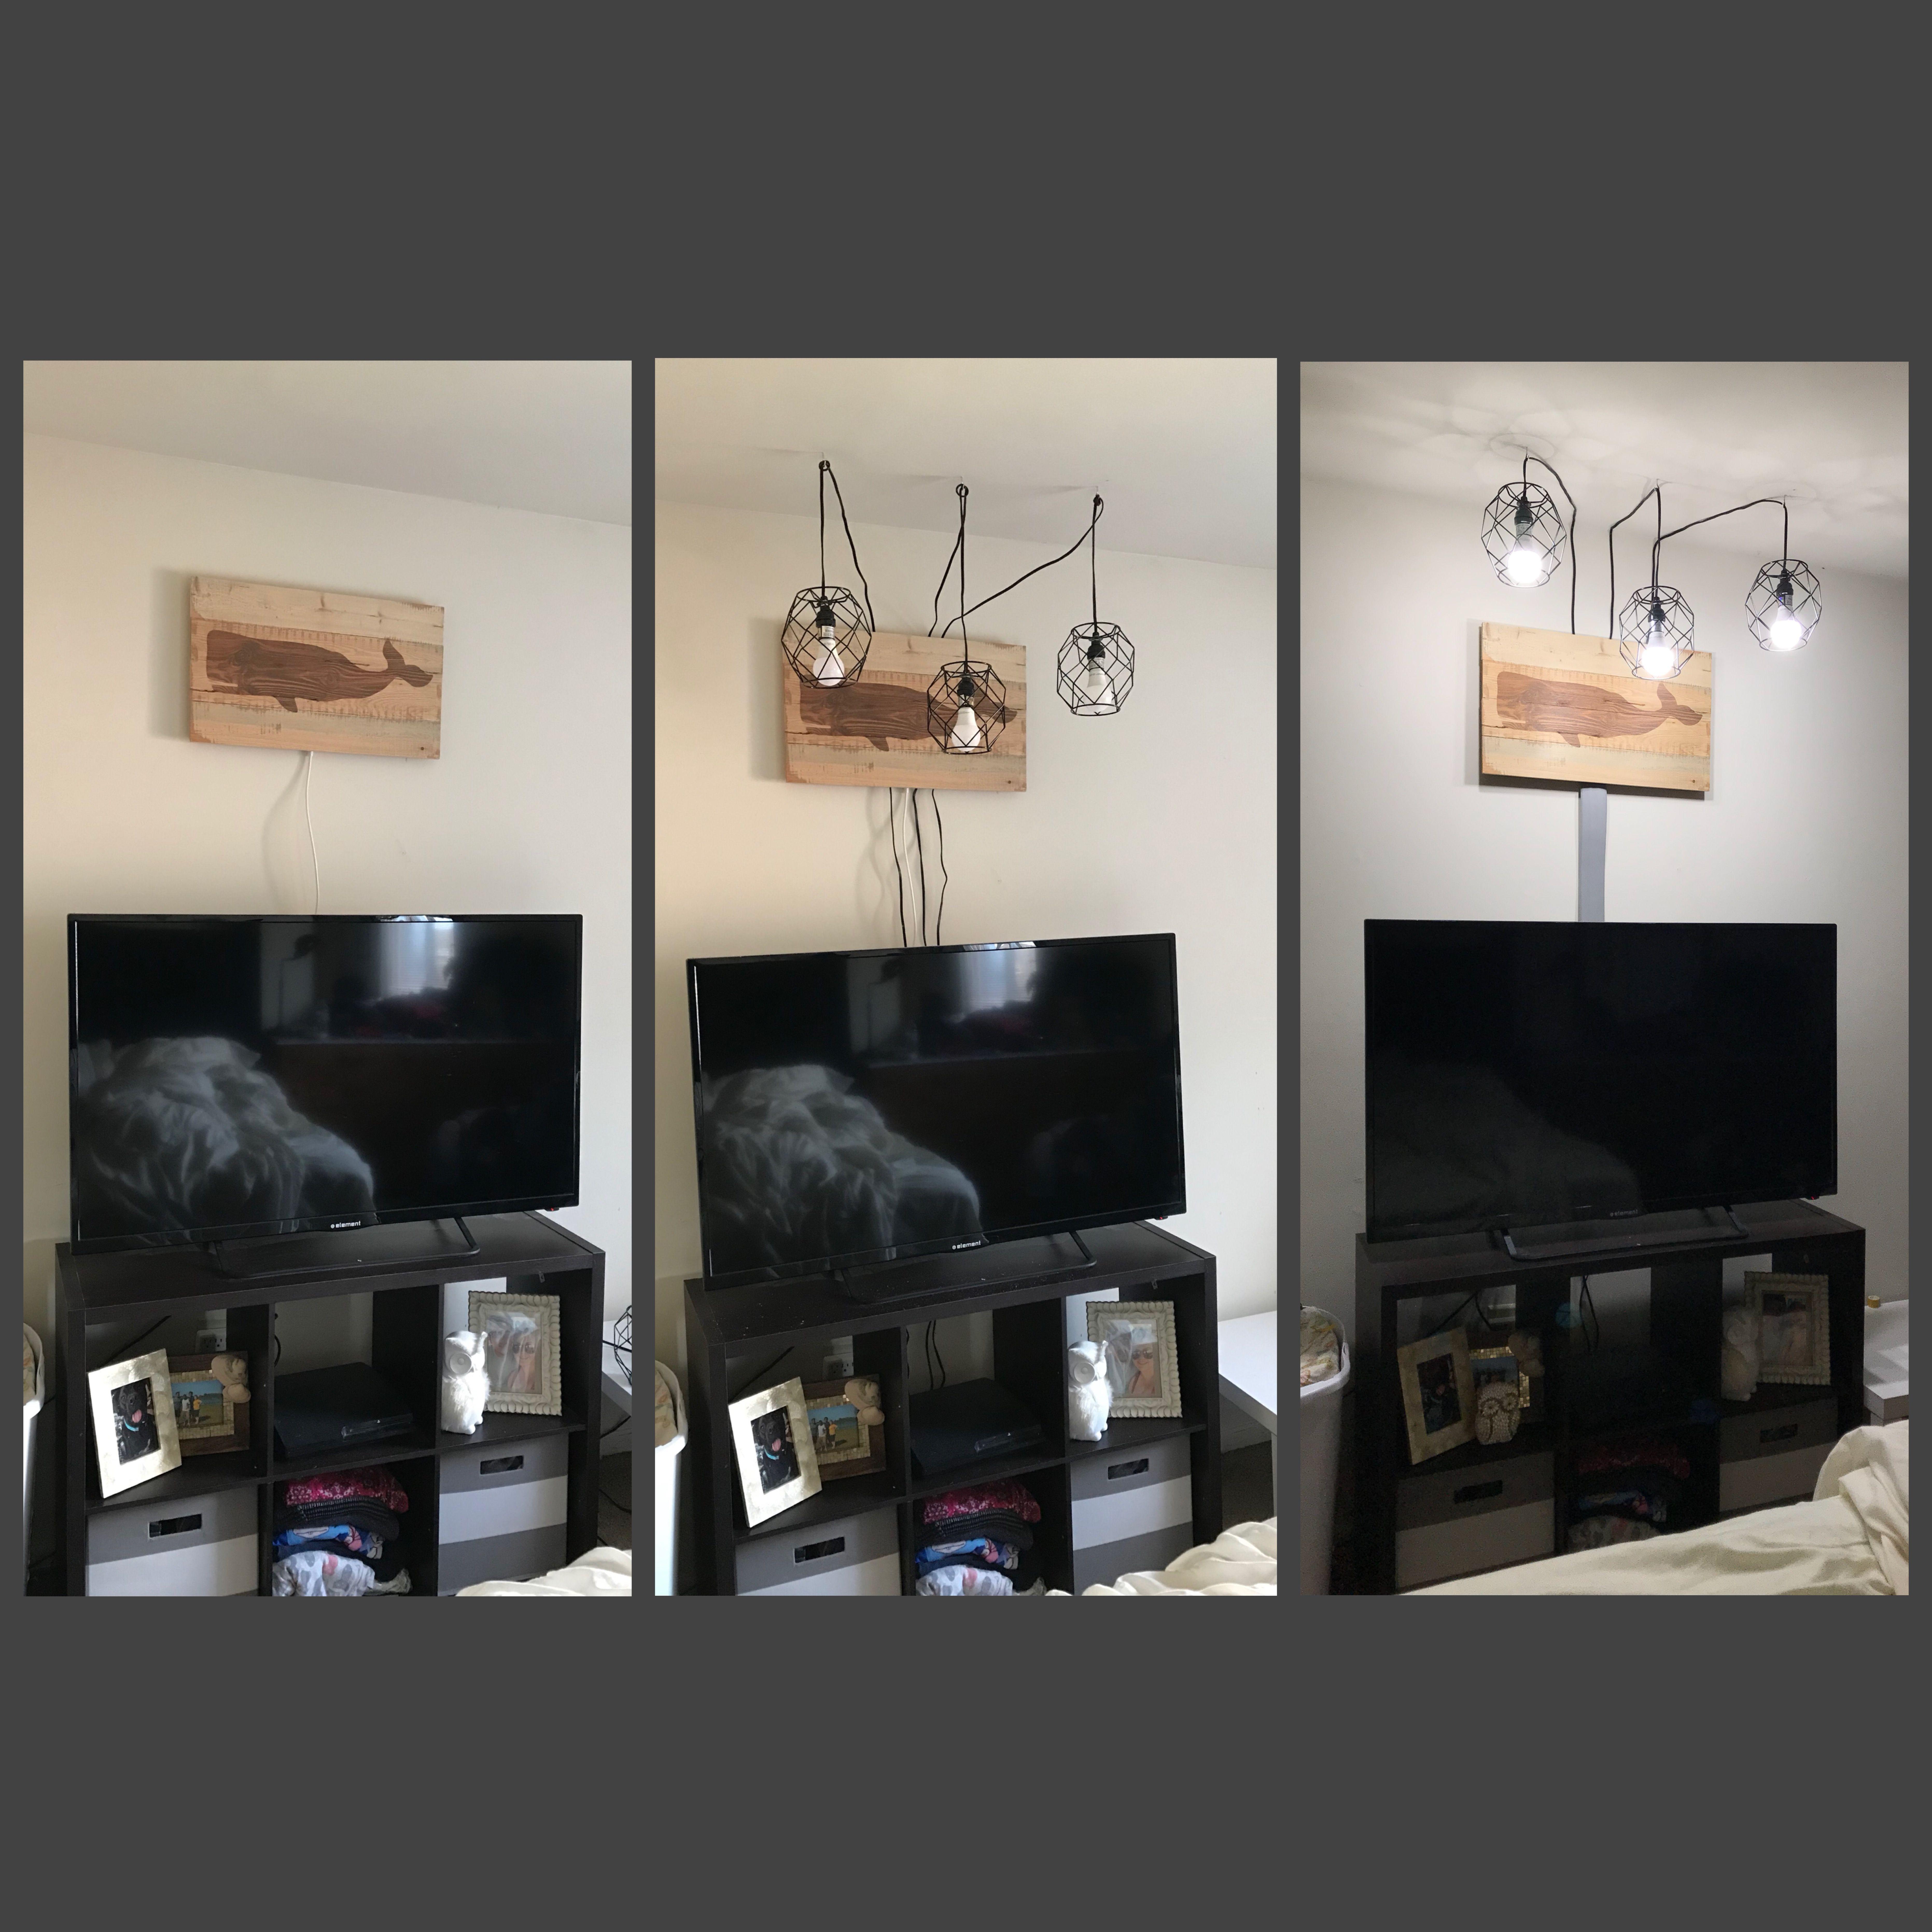 Pin on Apartment ideas/DIY!